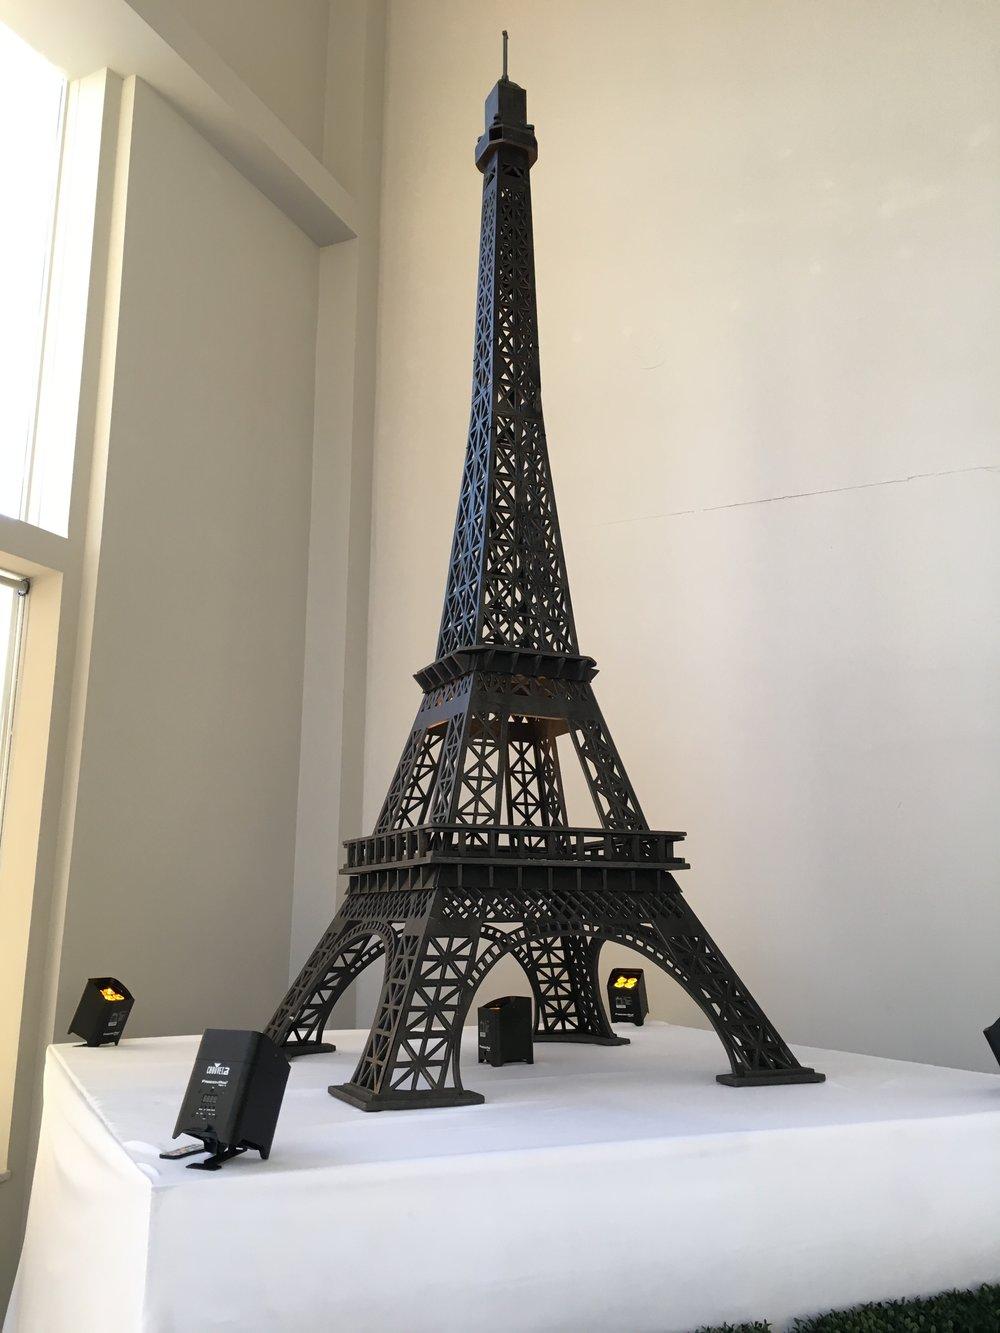 Eiffel+tower+prop+rental+design+eggsotic+events+party+rentals+decor+design.JPG